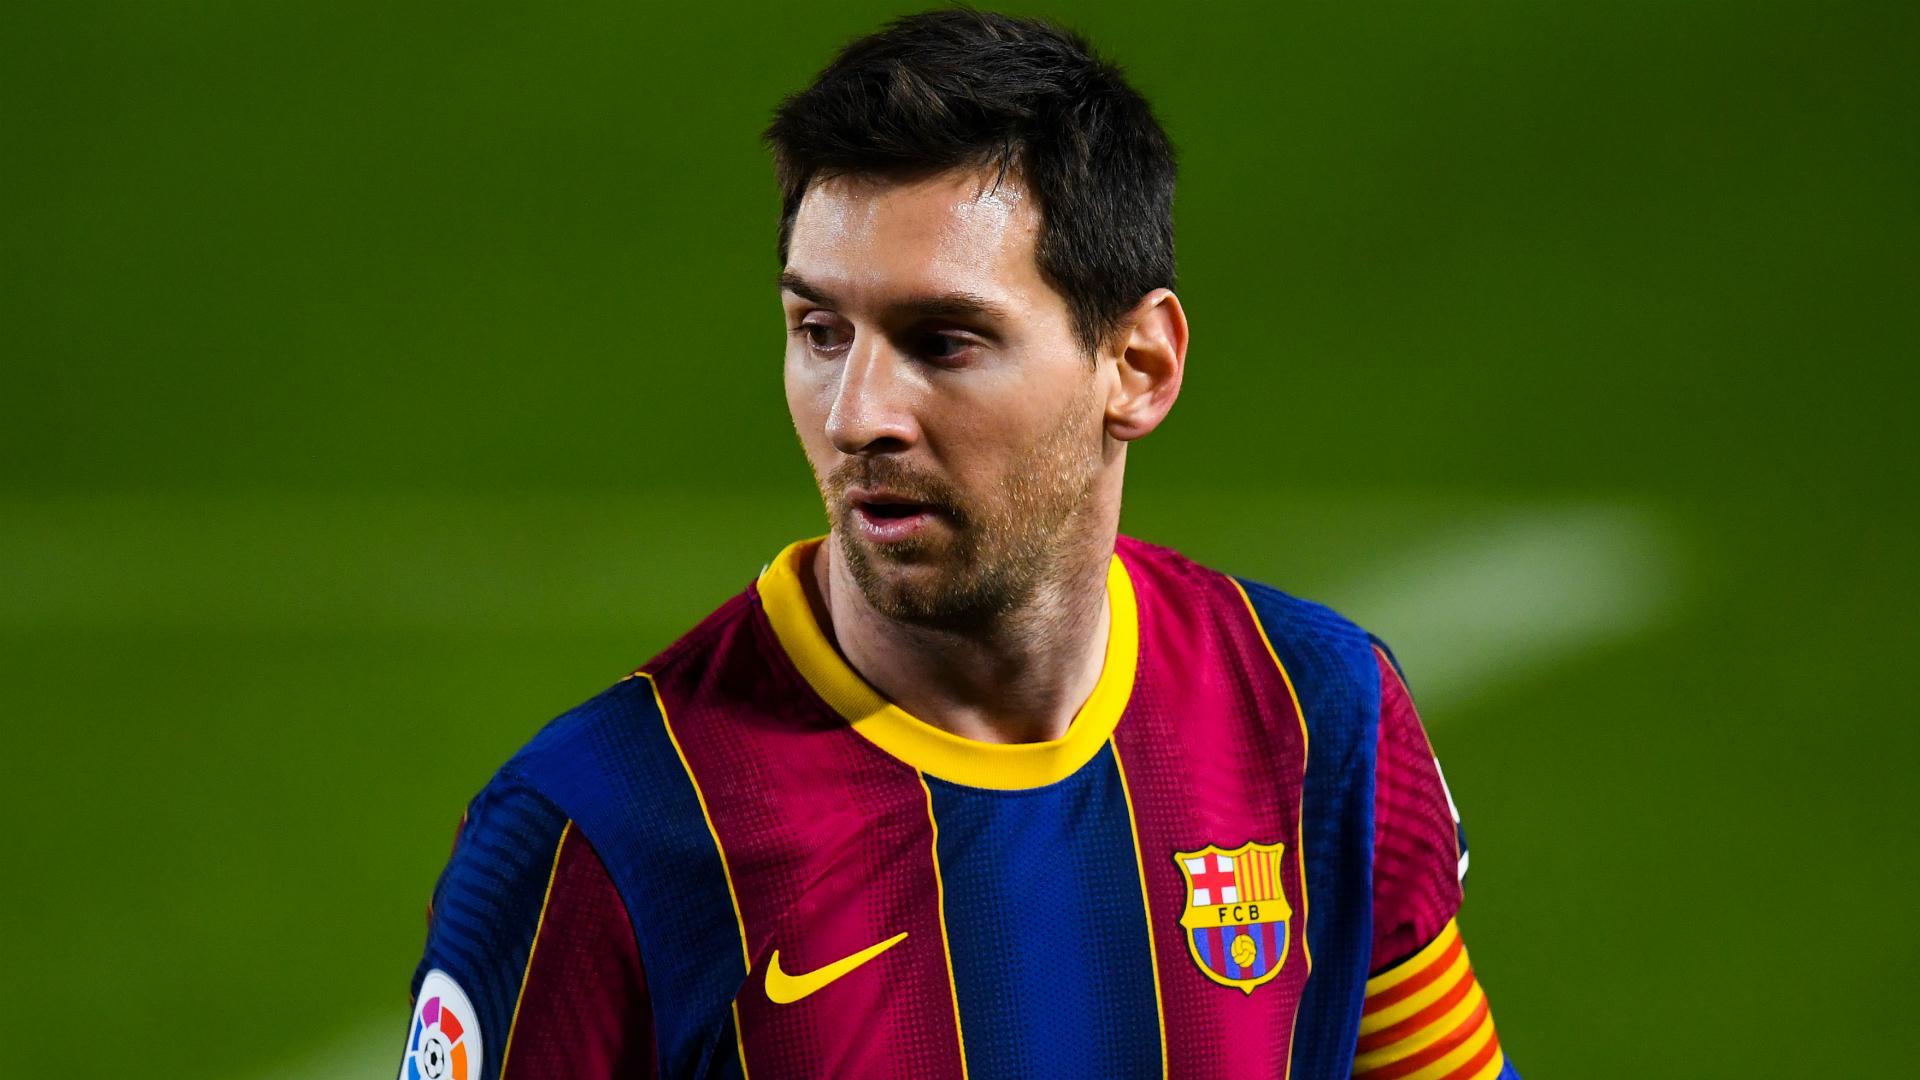 Messi to miss Eibar match as Barcelona grant captain extended Christmas break